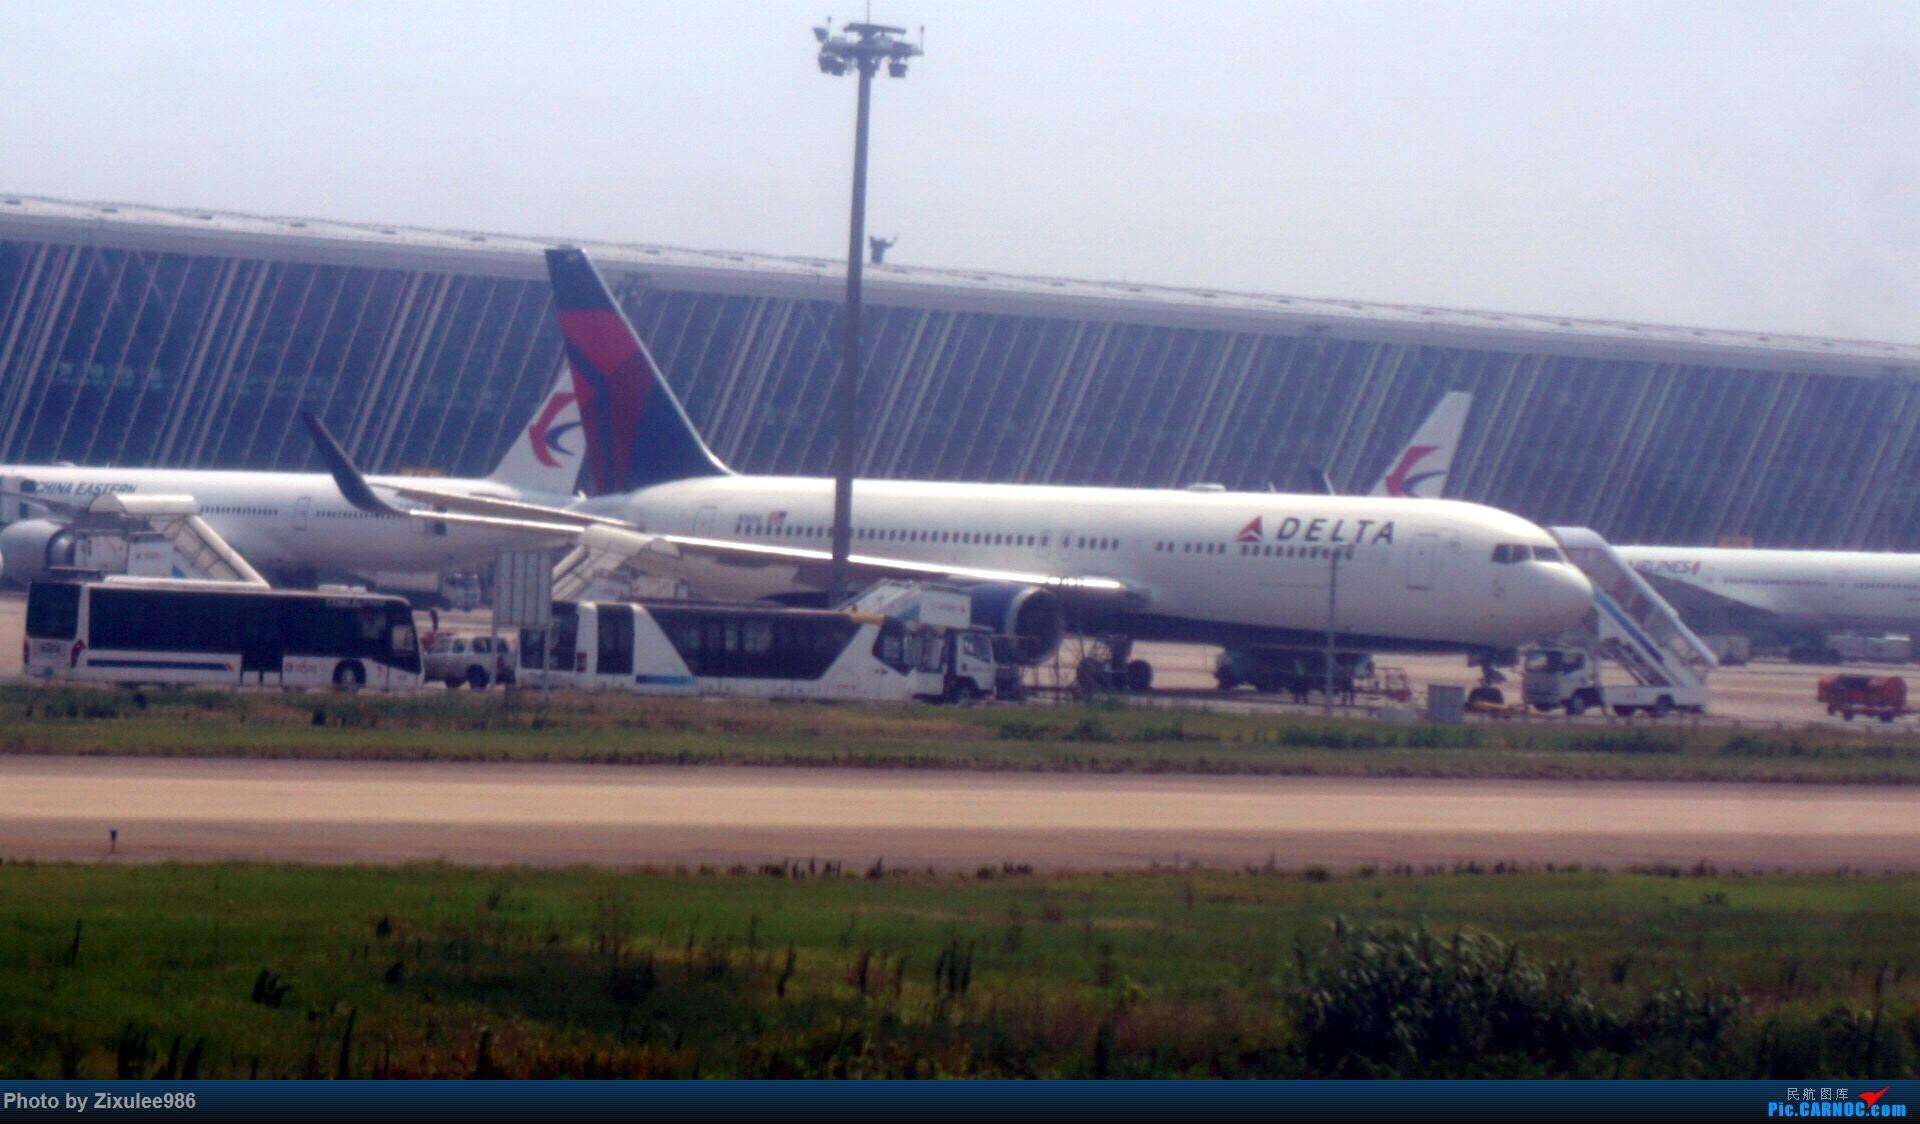 Re:[原创]加拿大21日游学之旅(一)~JJN-PVG-YYZ..(内含flightlog)~第一次发游记~多图缓更请谅解 BOEING 767-300(ER)  中国上海浦东国际机场